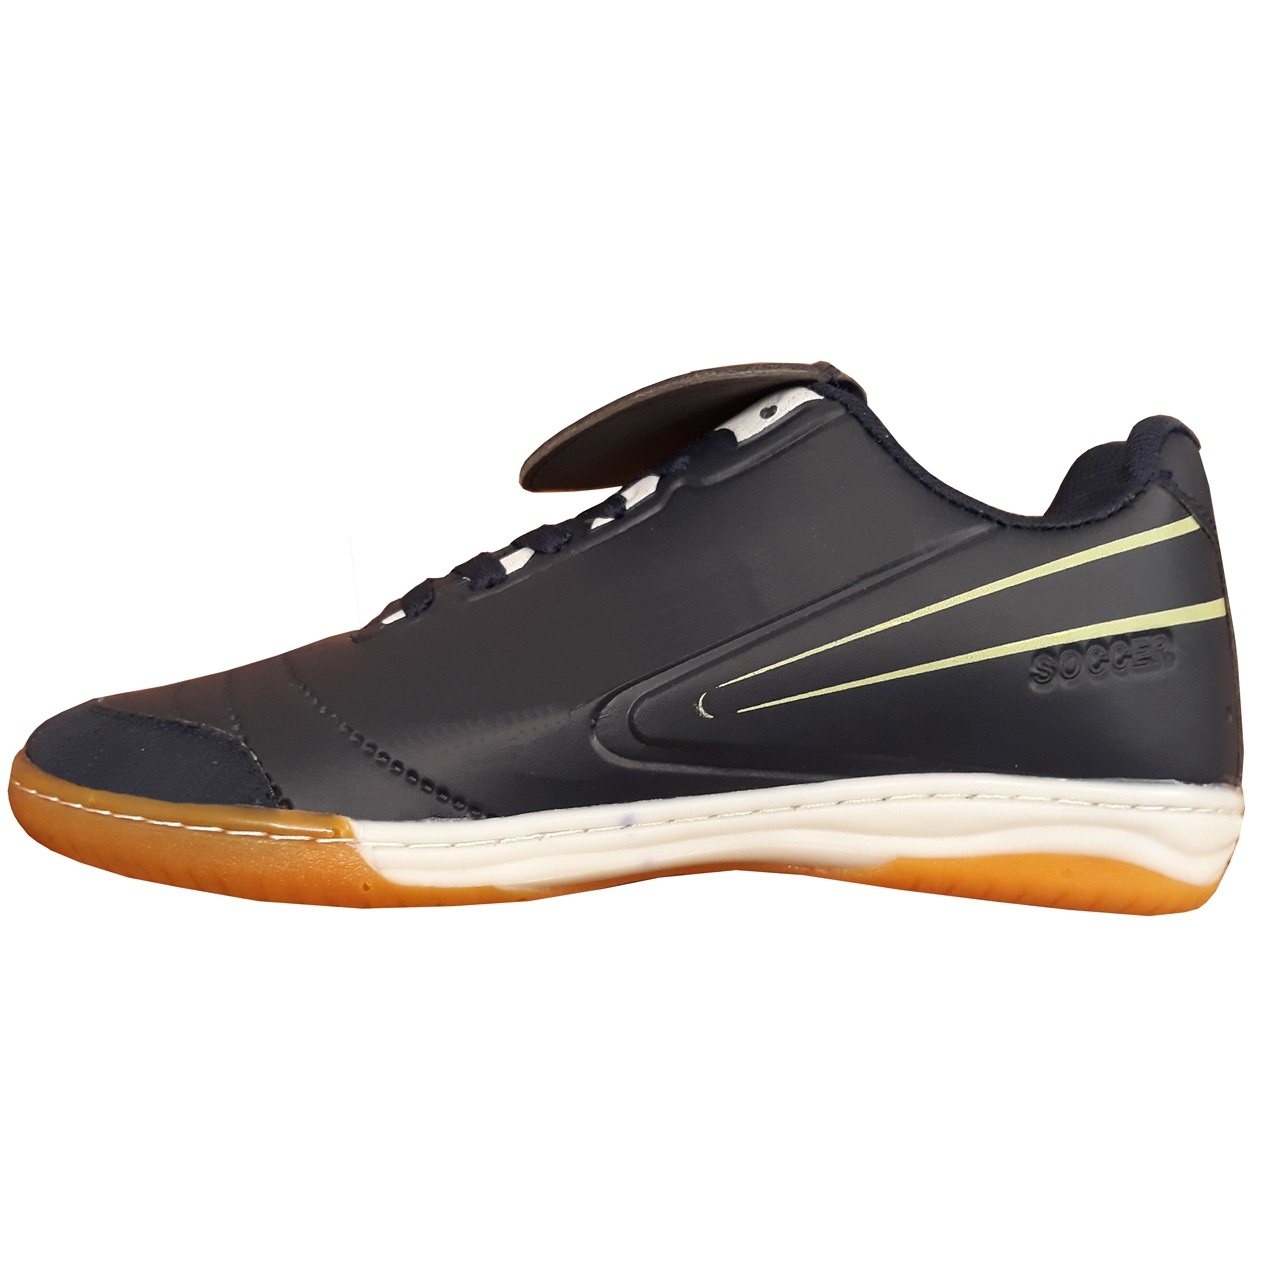 کفش فوتسال مردانه ساکر کد 2021